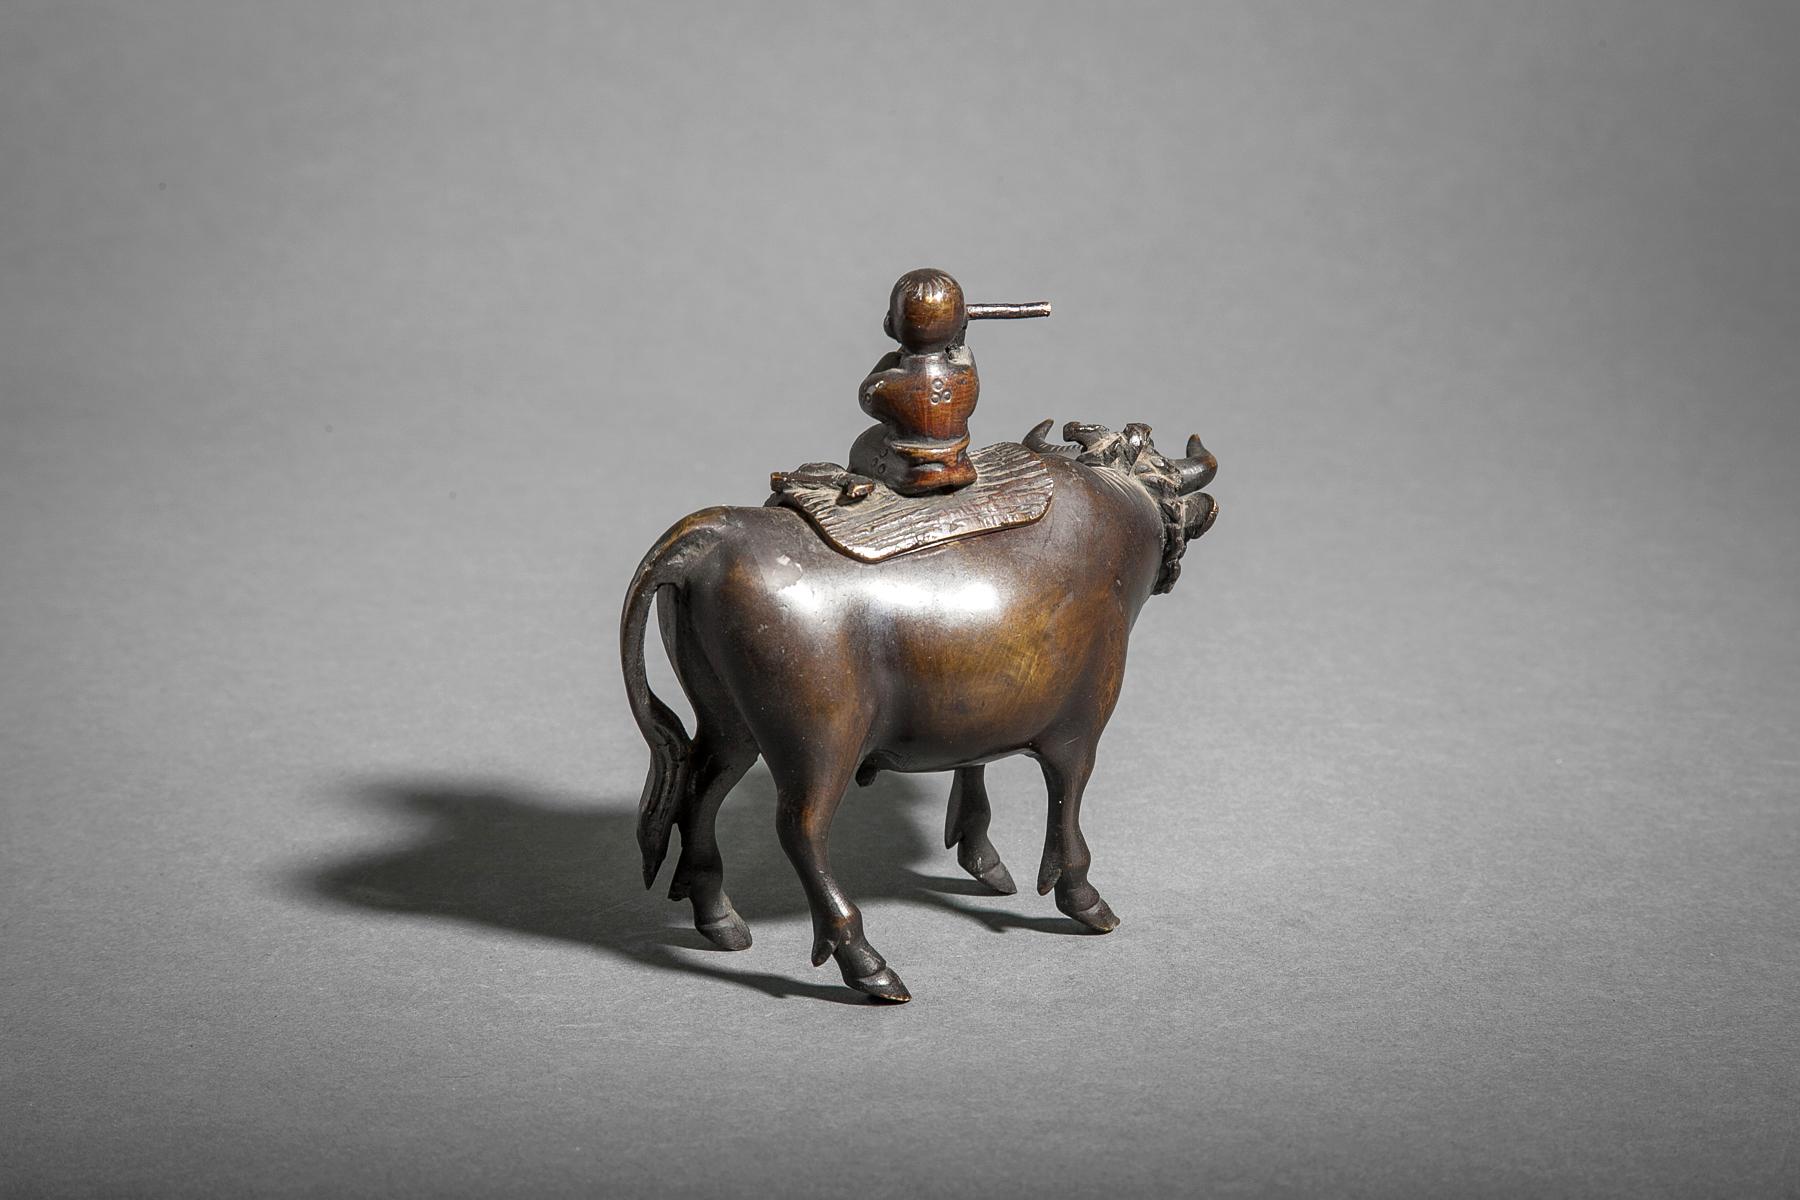 18th Century Bronze Censer of a Boy Riding a Bull